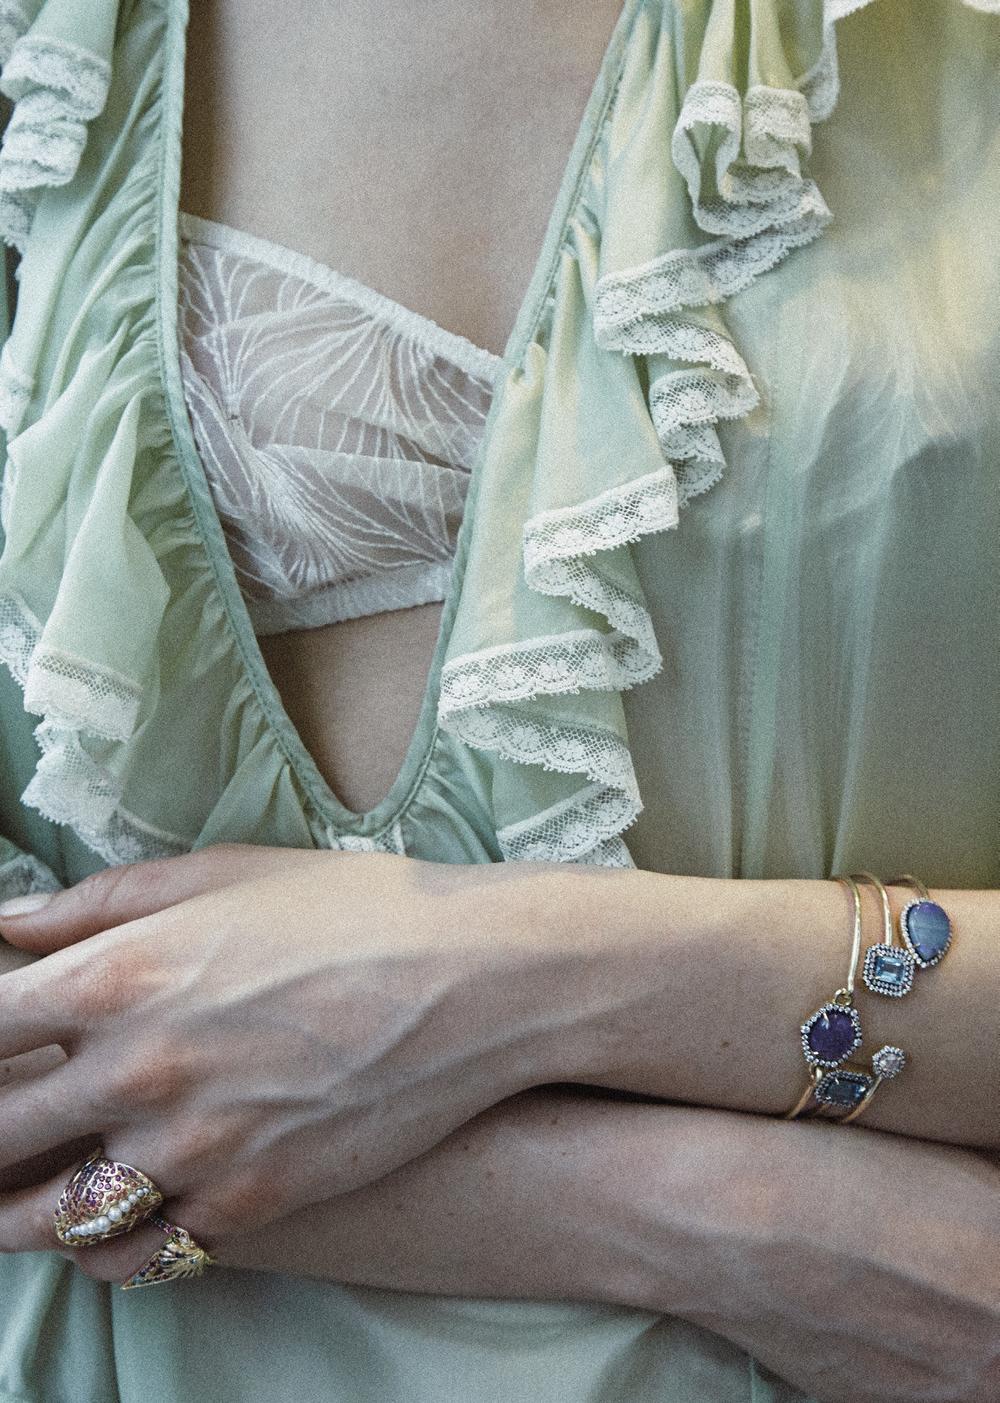 Vestido de  MIU MIU , Sujetador de  ARAKS , brazaletes de  GEMMA WYNNE , anillos de  VENYX